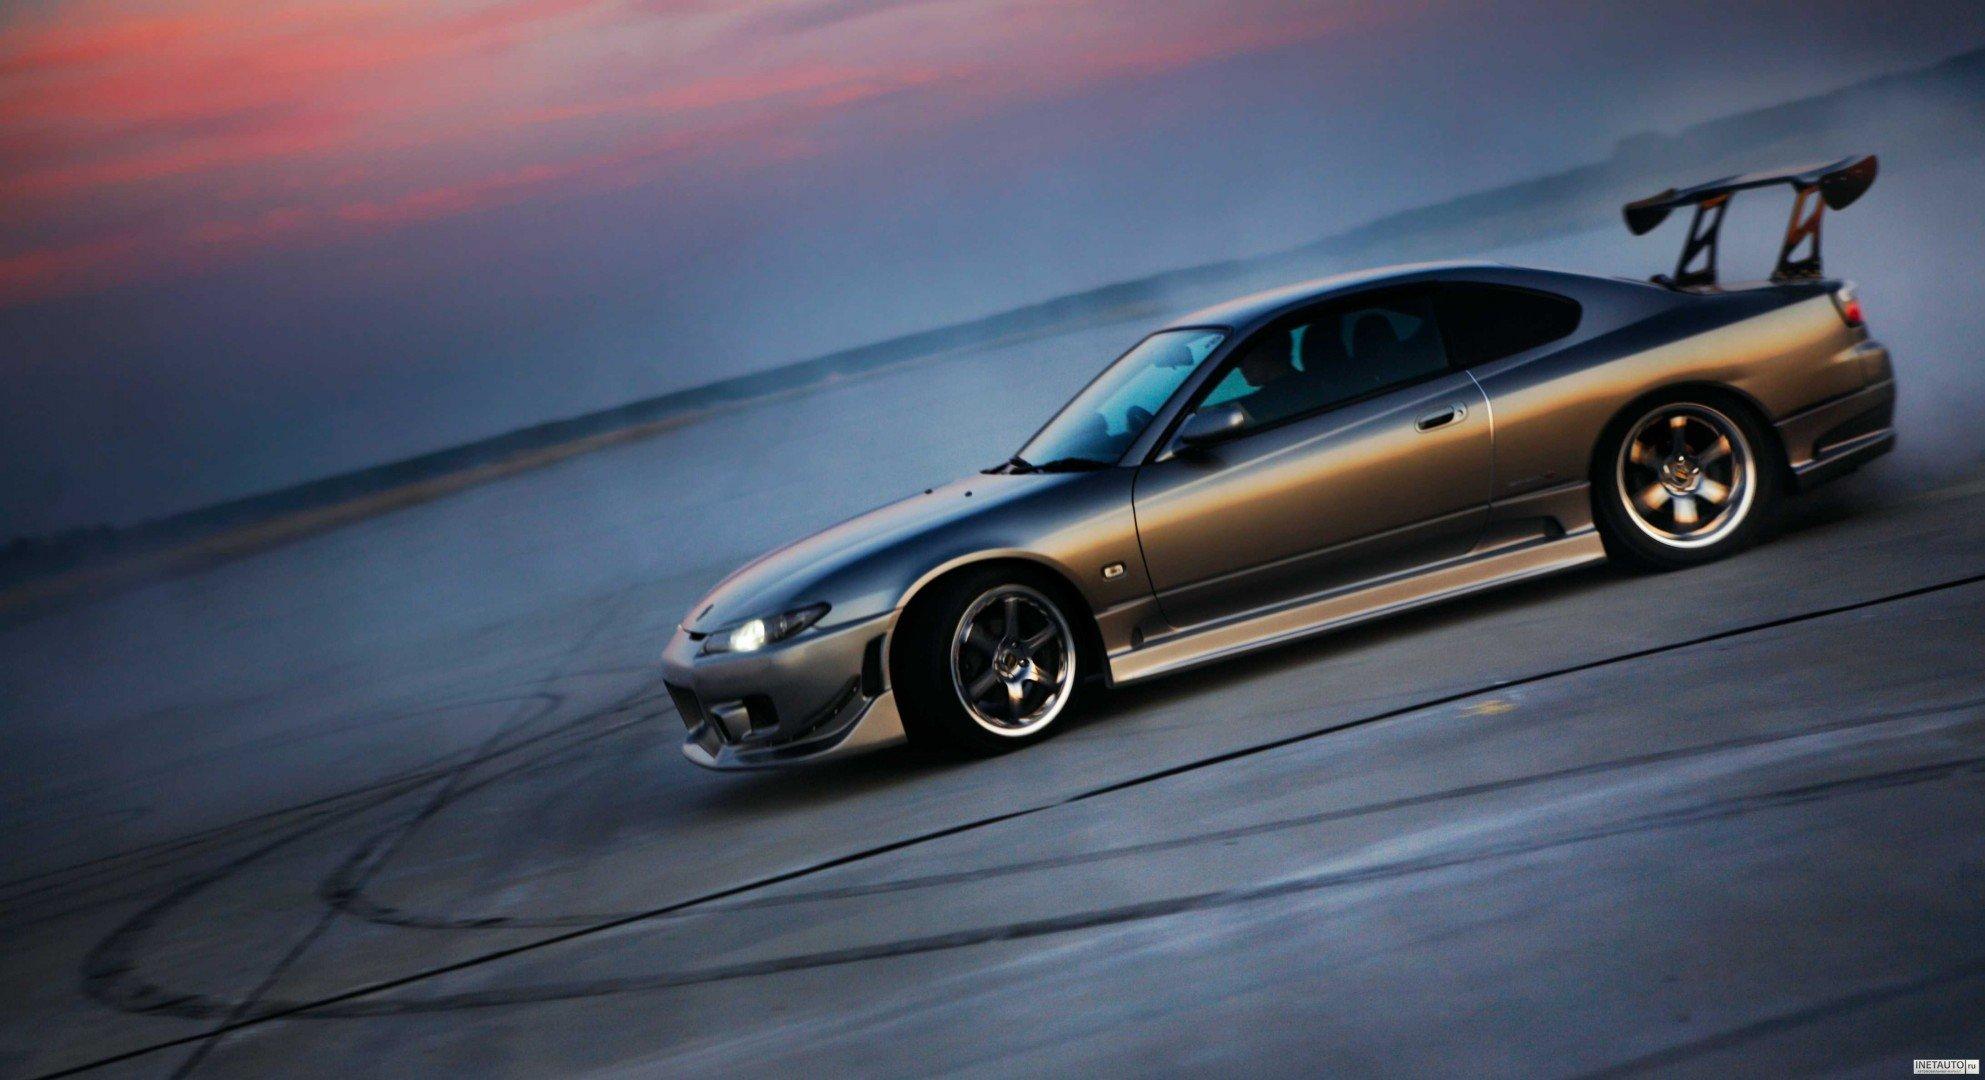 Nissan Silvia S15 Wallpaper Nissan Silvia Wallpaper S15 1485084 Hd Wallpaper Backgrounds Download